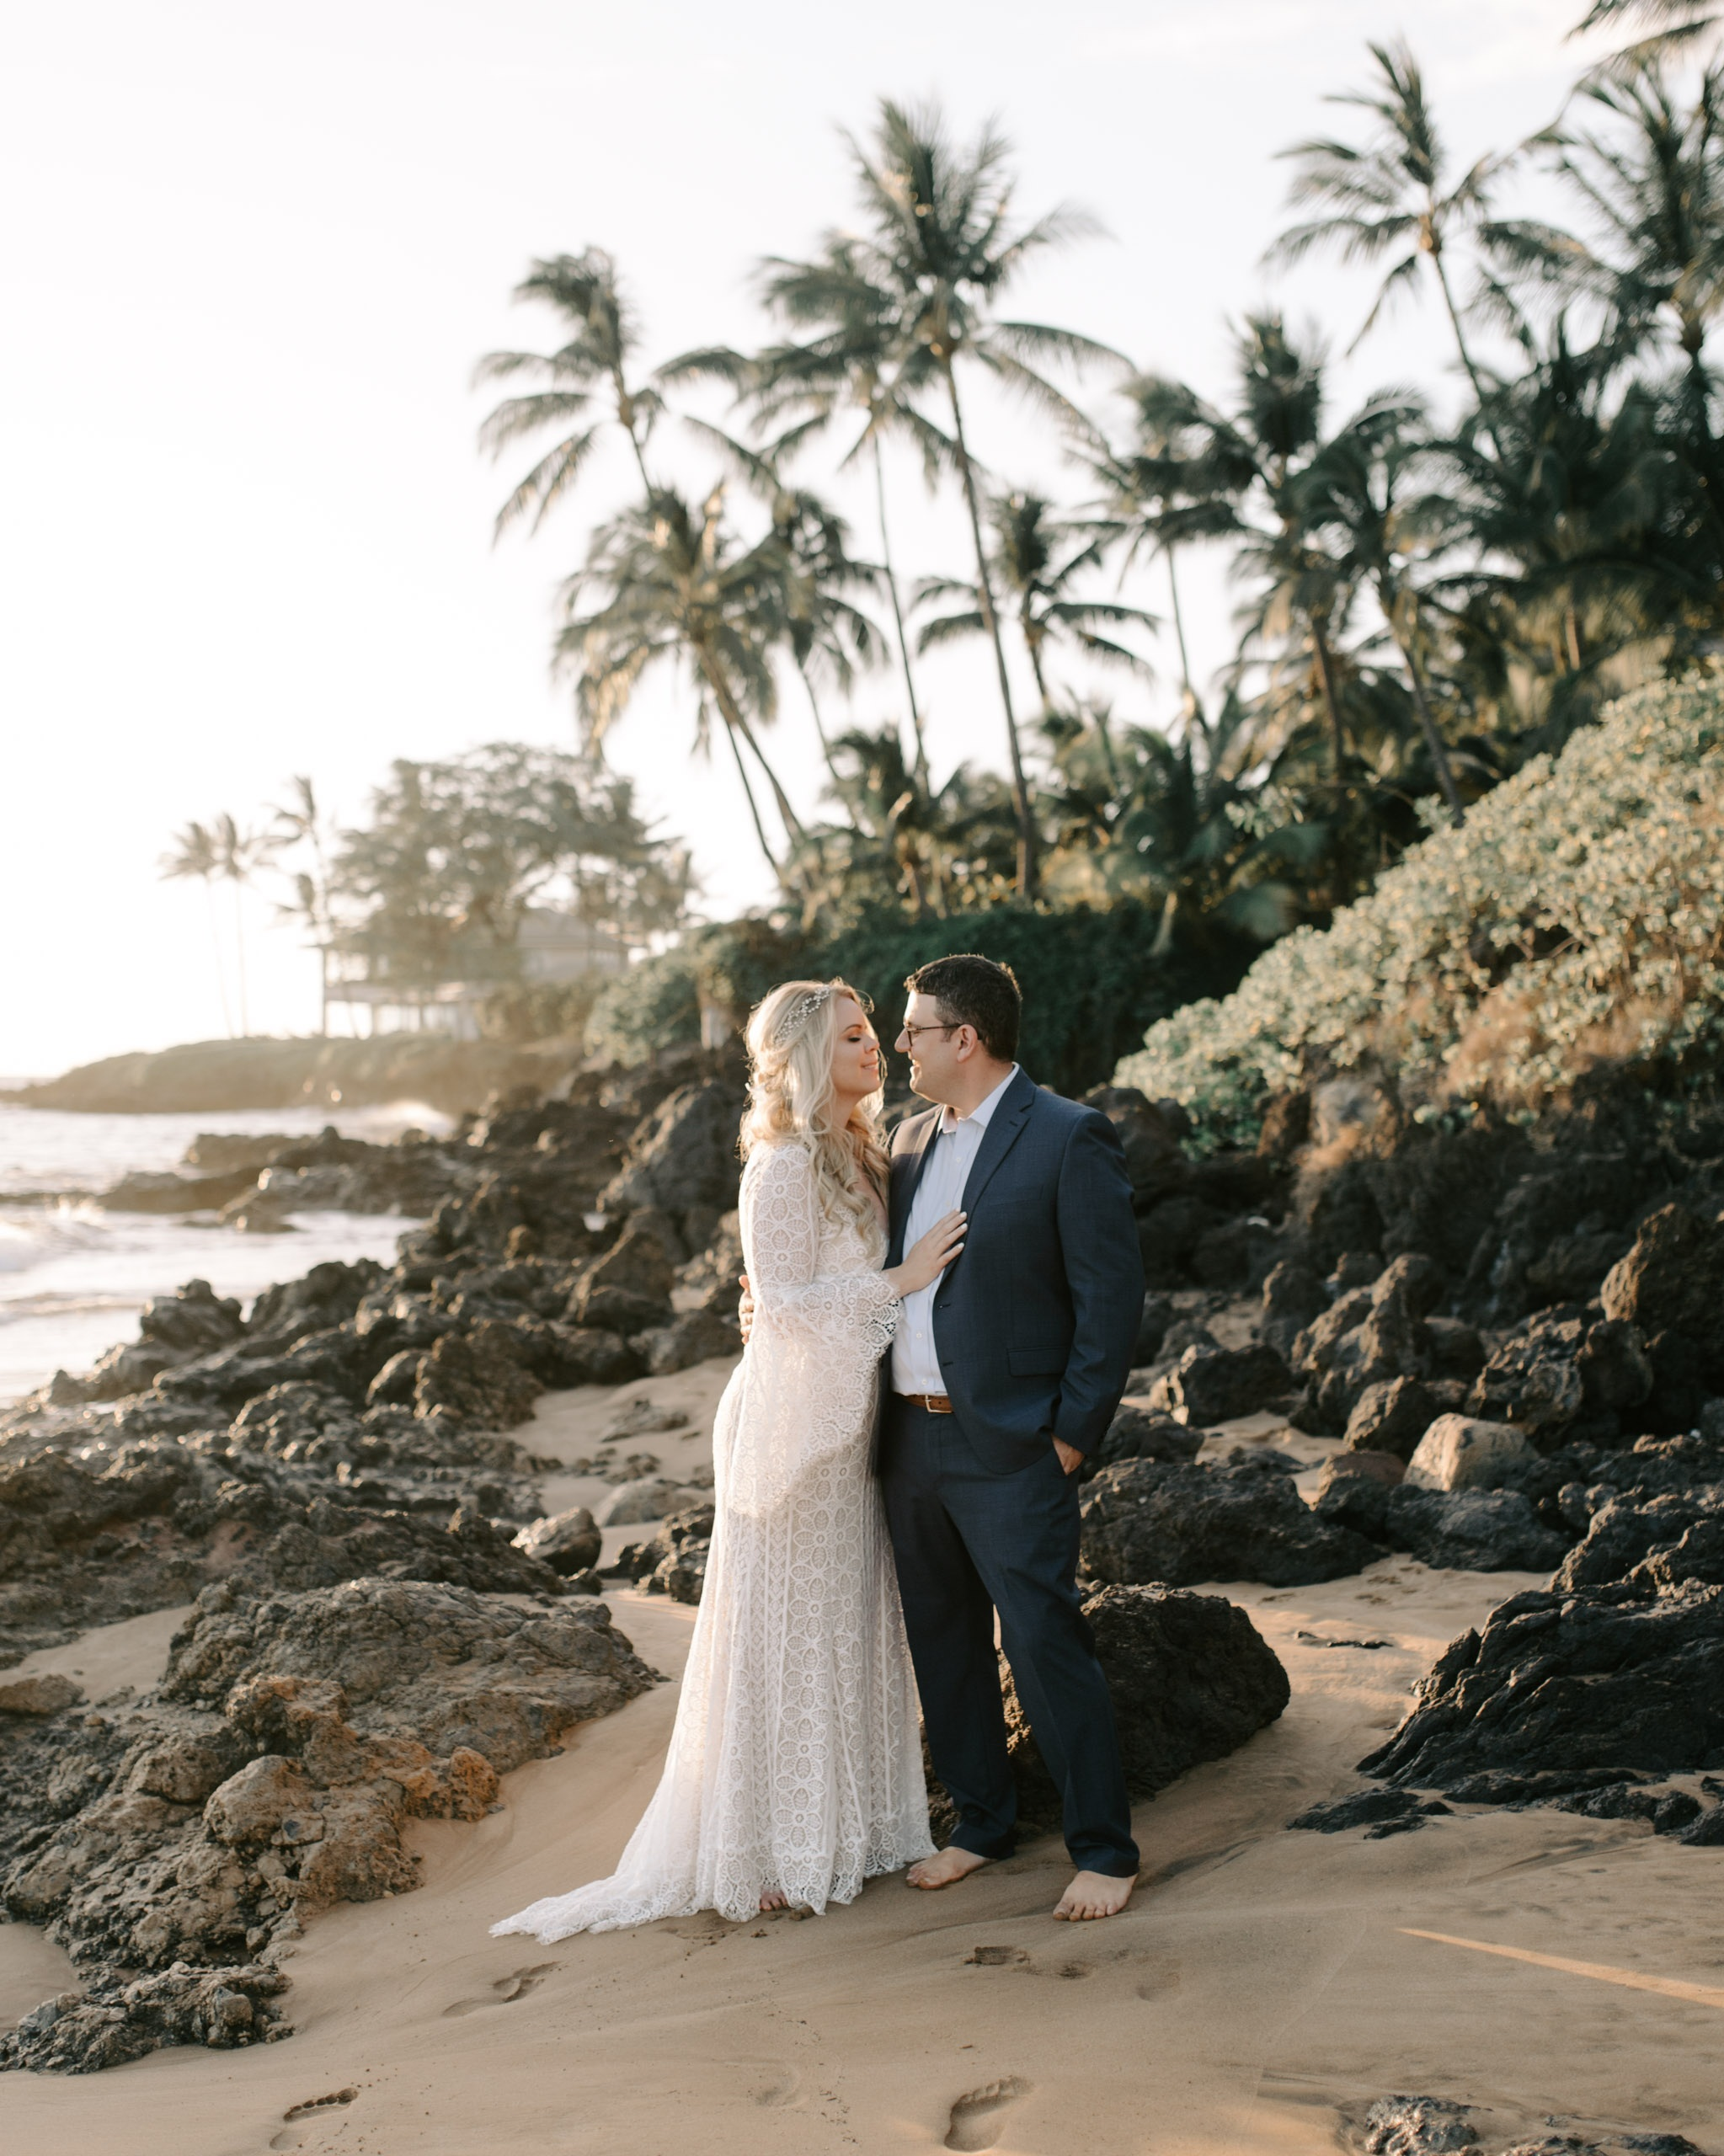 Andaz+Maui+Wailea+Resort+Wedding+By+Oahu+Wedding+Photographer+Desiree+Leilani